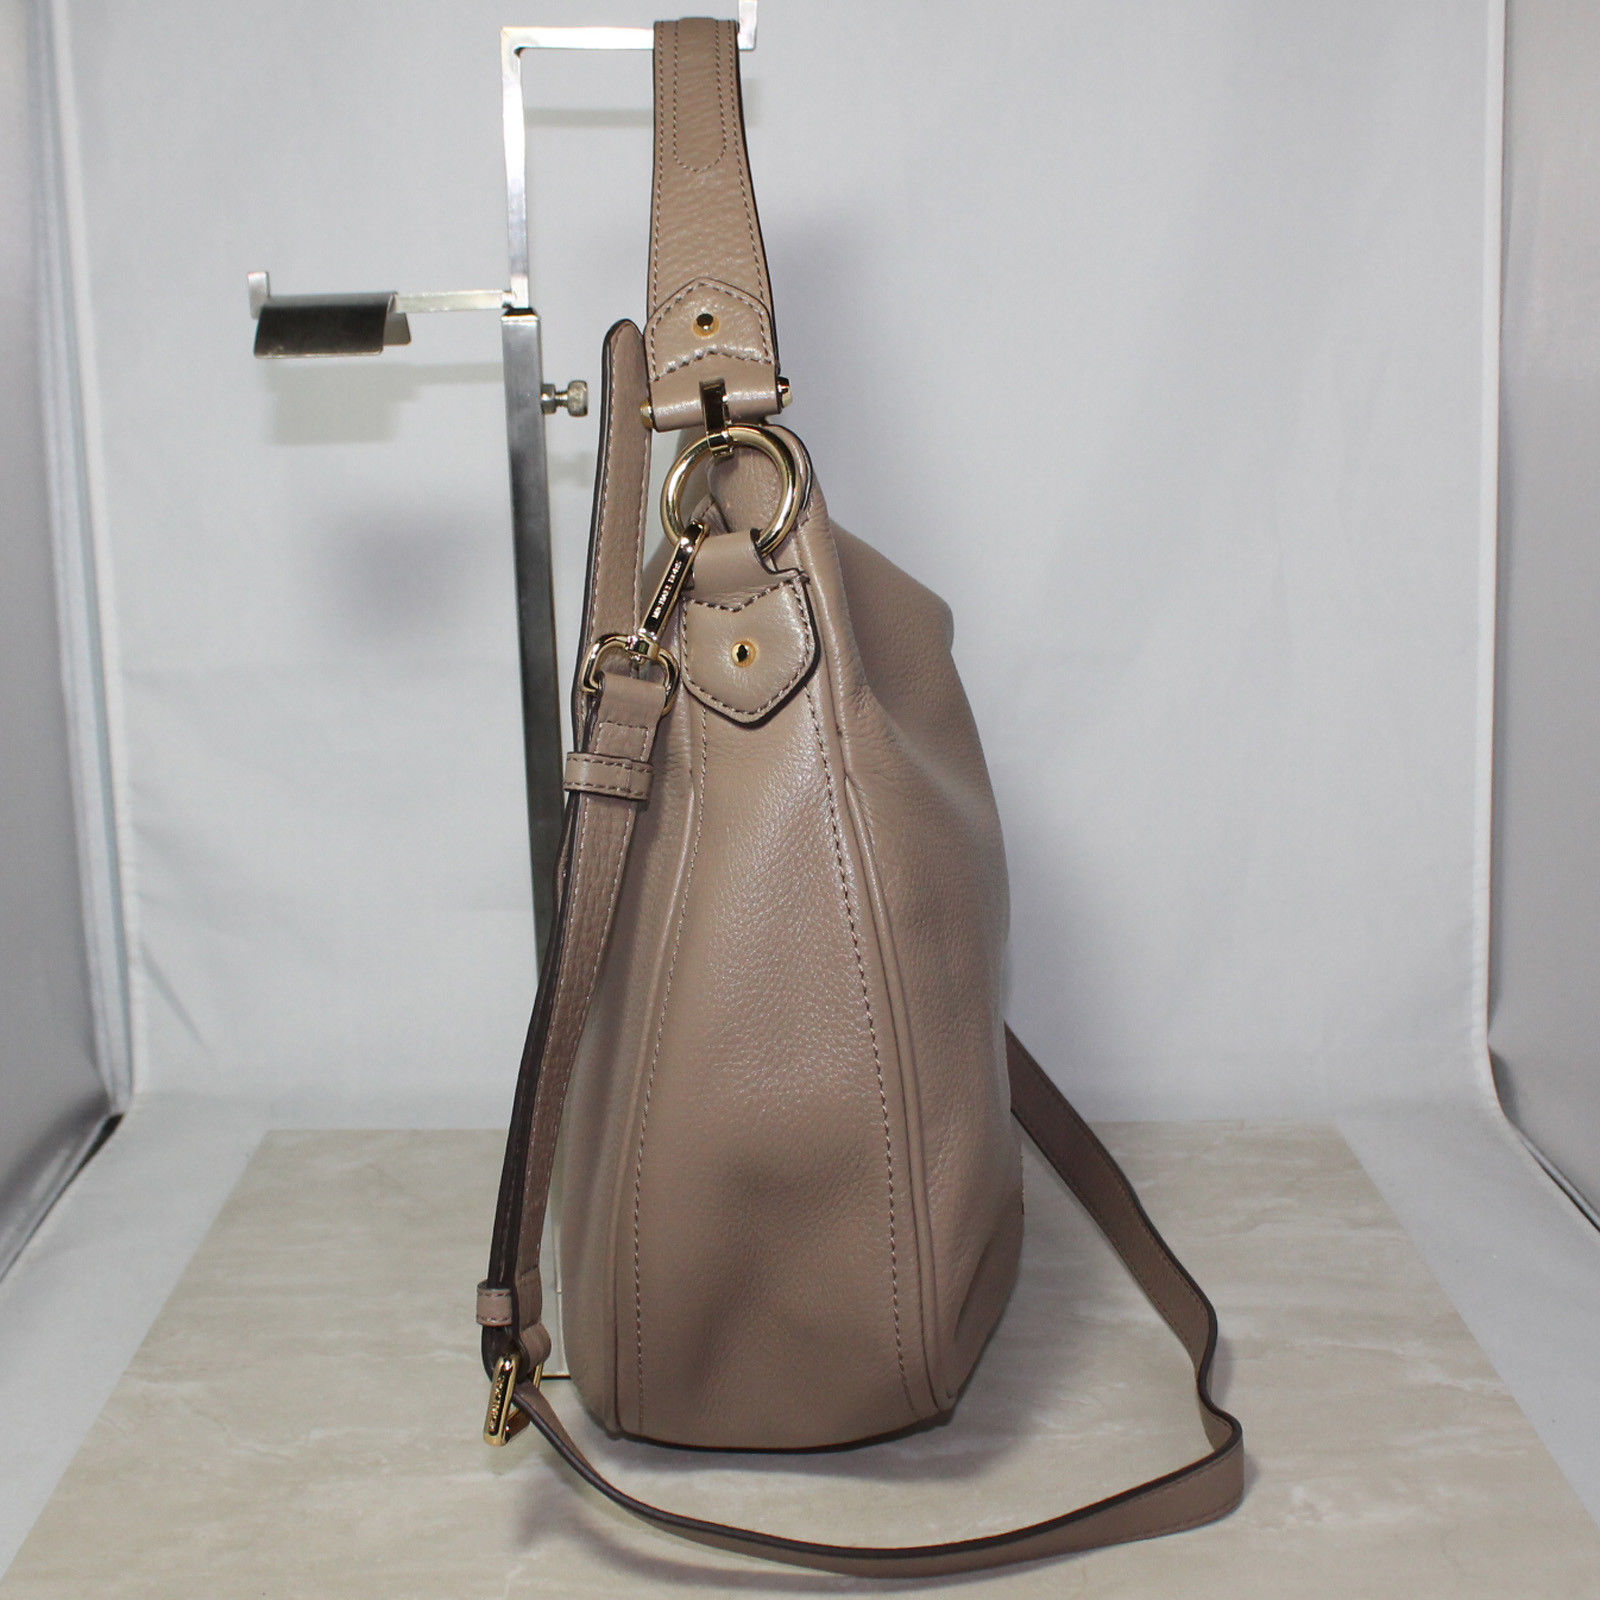 29f49d21ea4158 Michael Kors MK Taupe Women's Heidi Hobo Tote Bag 30T6GH6L2L (852 ...